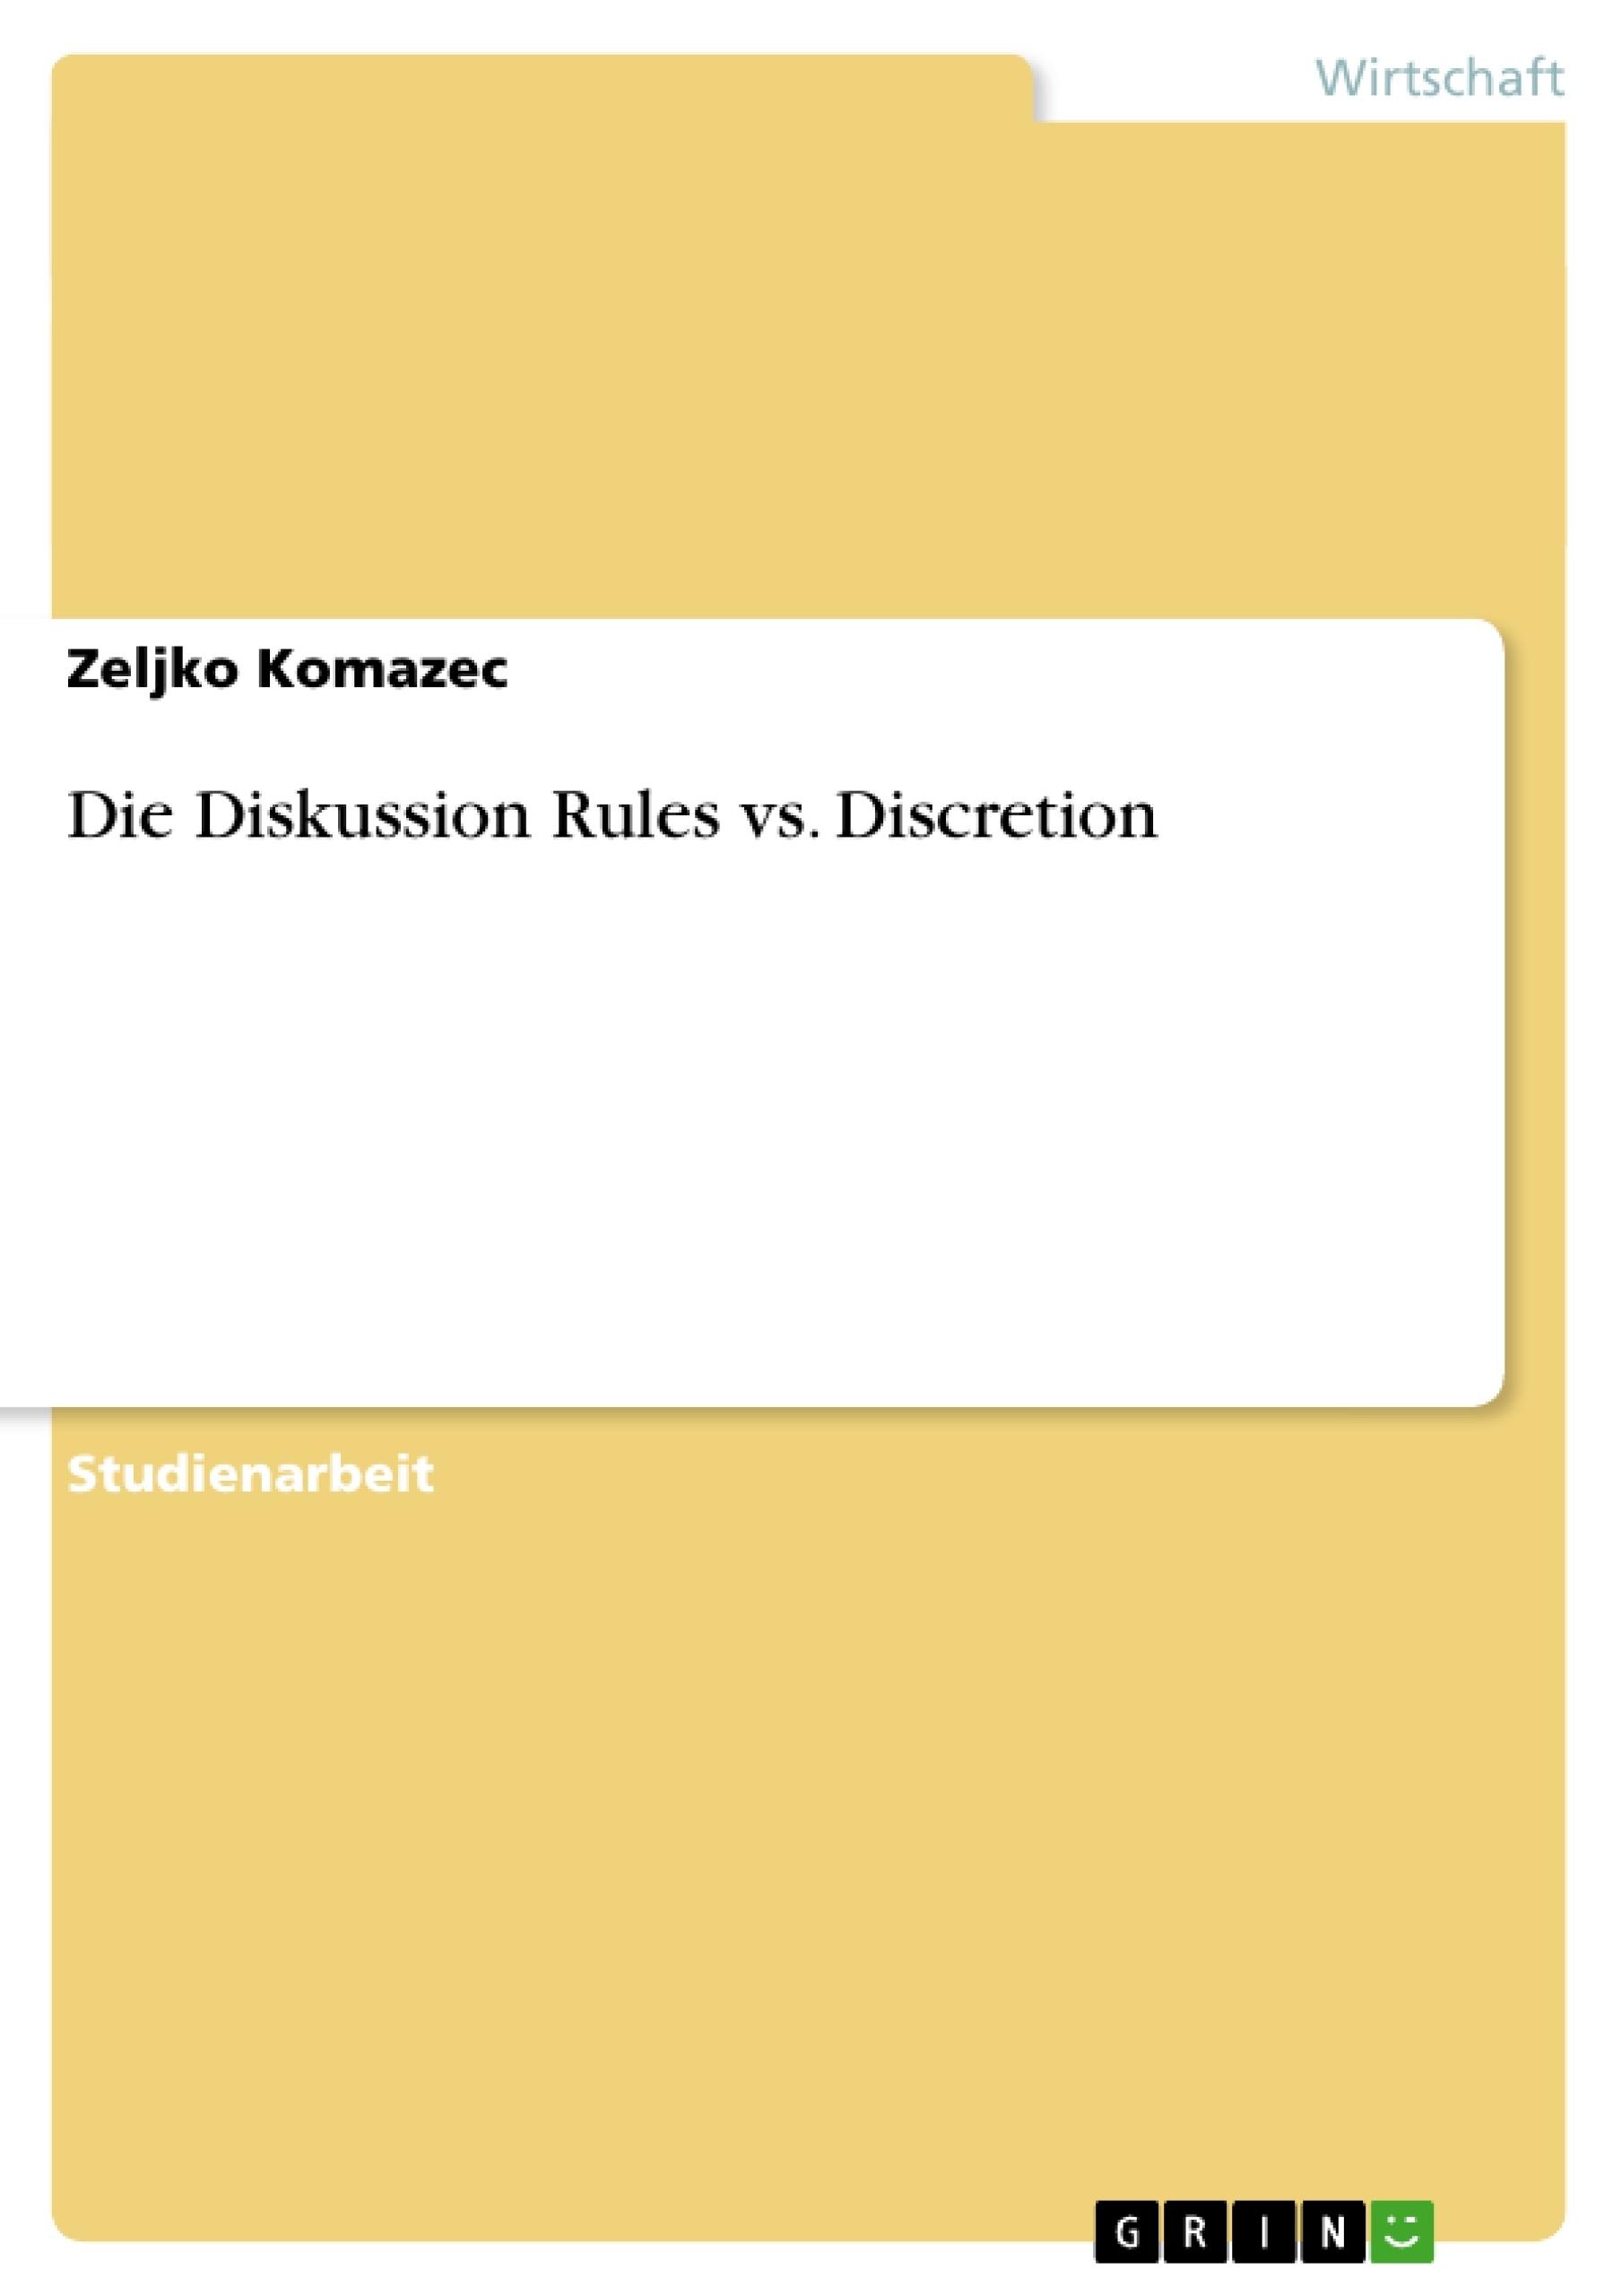 Titel: Die Diskussion Rules vs. Discretion